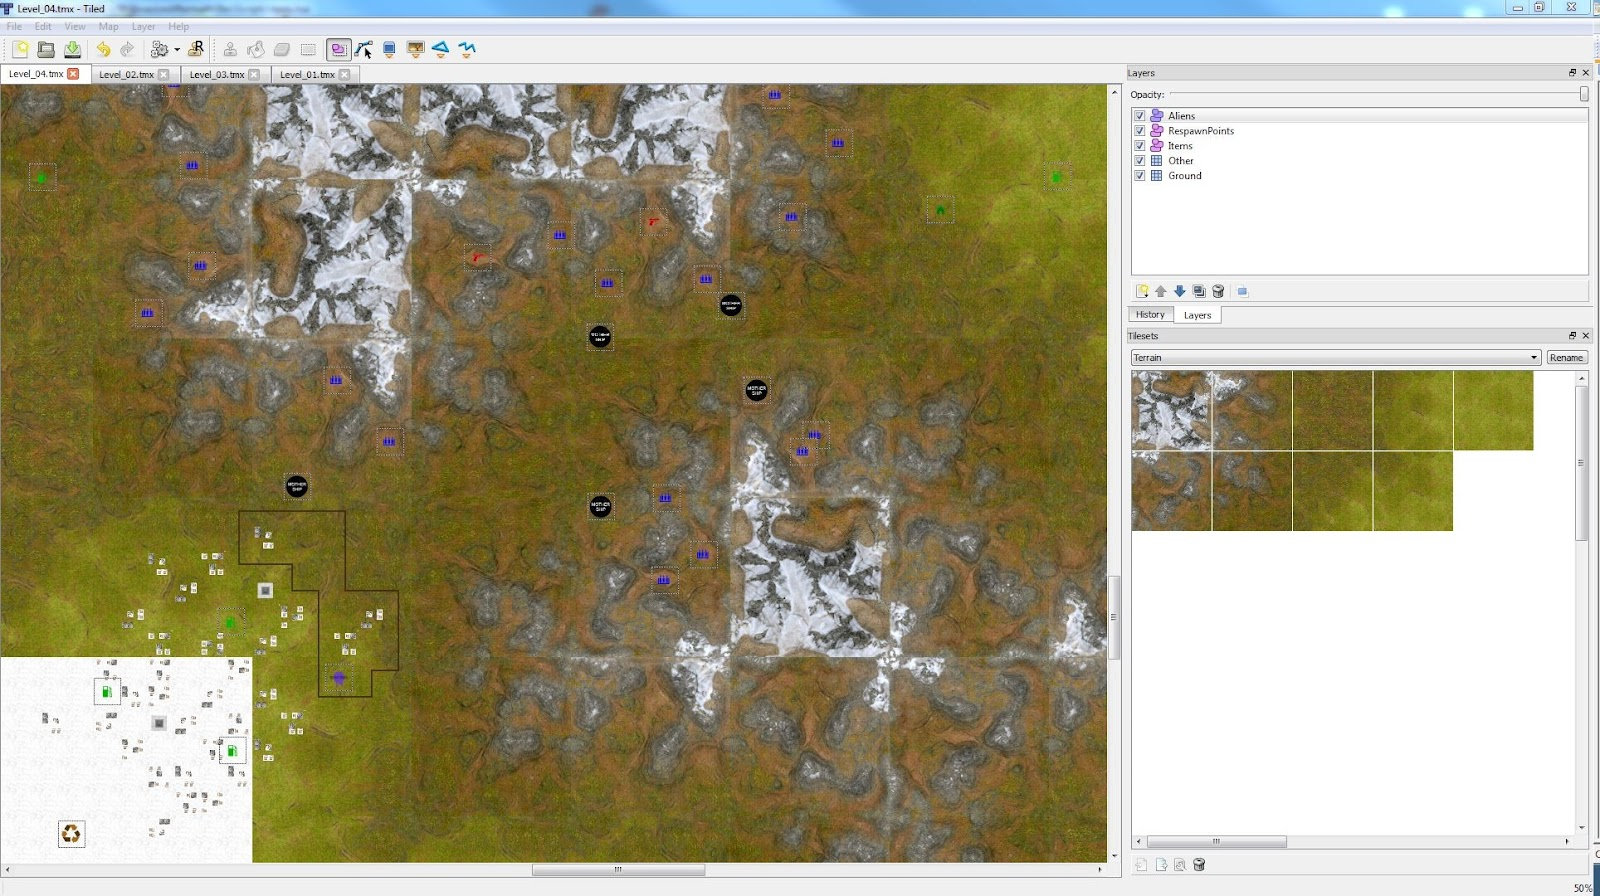 myGarageGame: Terrain tiles